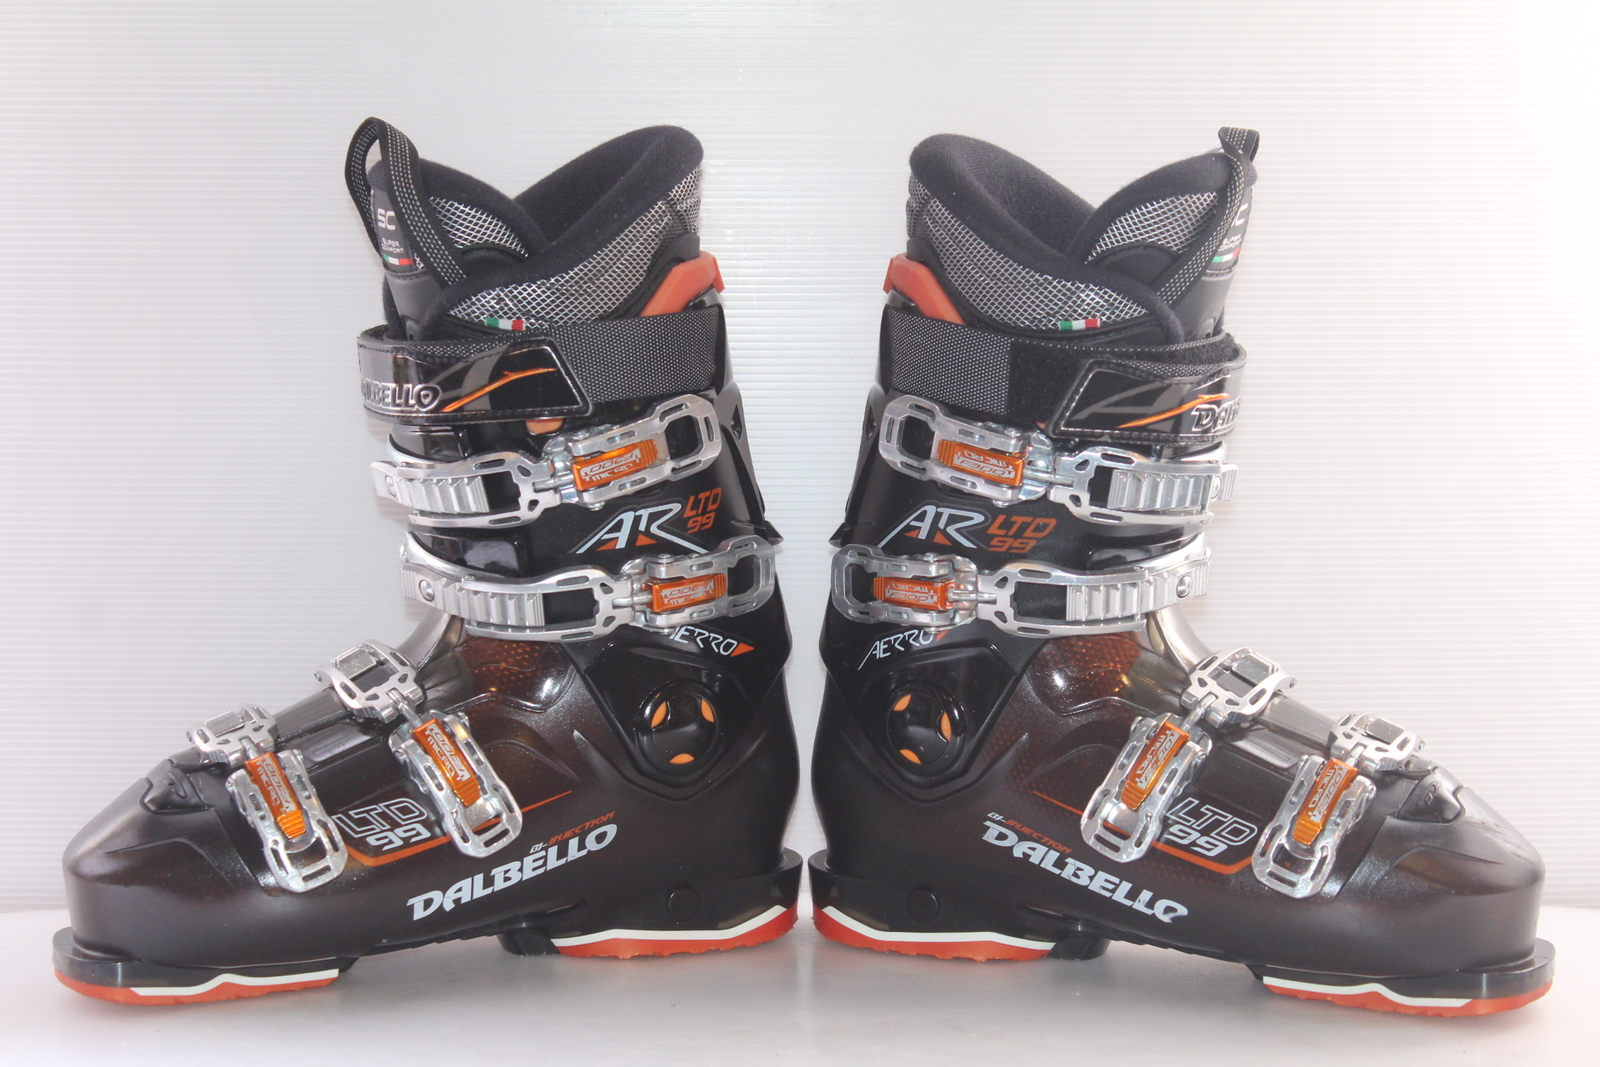 Lyžařské boty Dalbello Aero LTD 99 vel. EU40